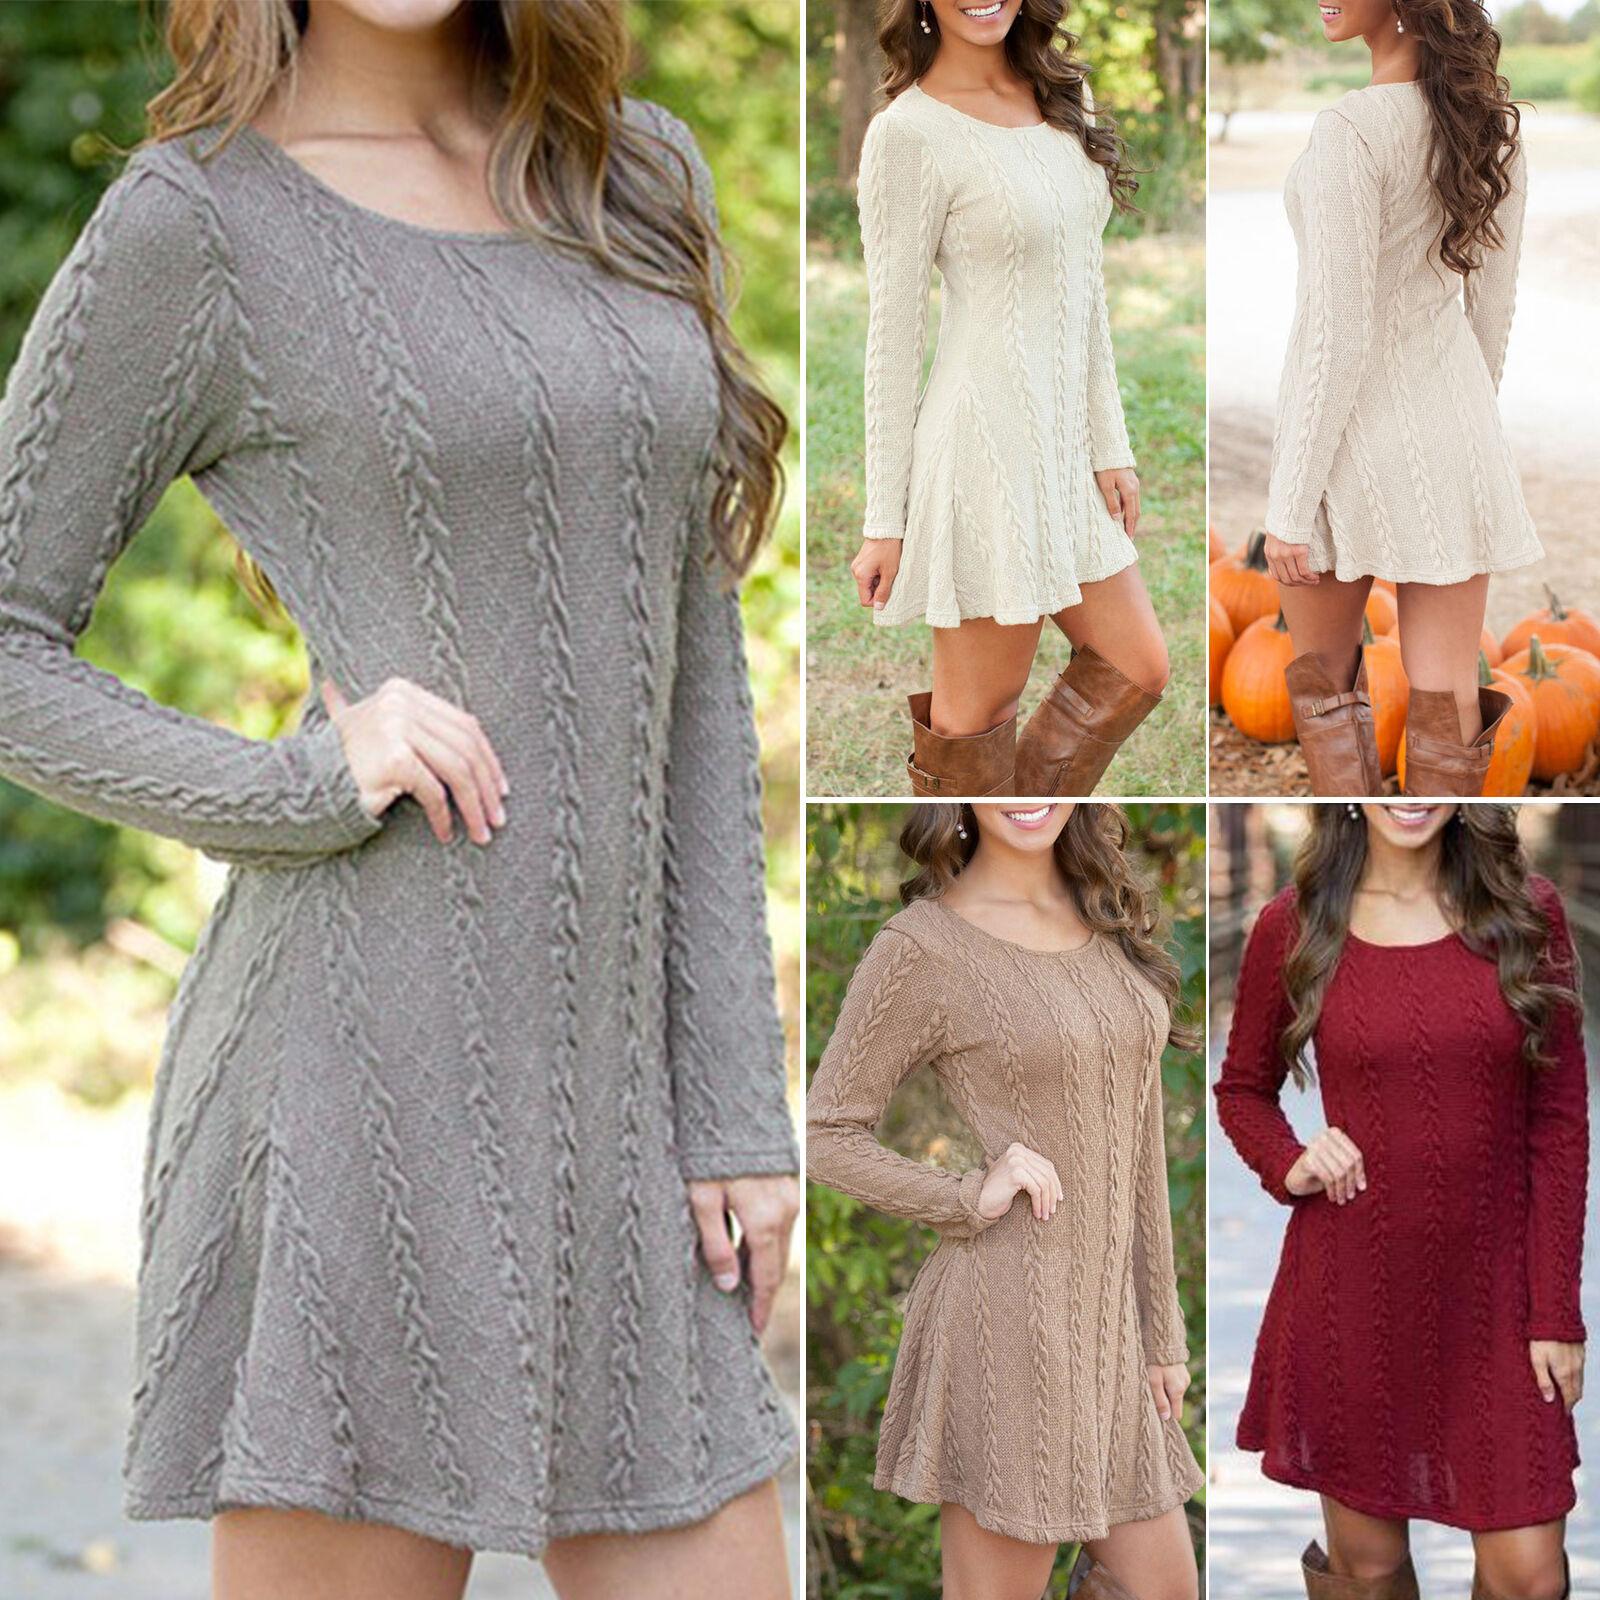 Dress - Womens Winter Long Sleeve Jumper Tops Ladies Slim Knitted Sweater Mini Dress US